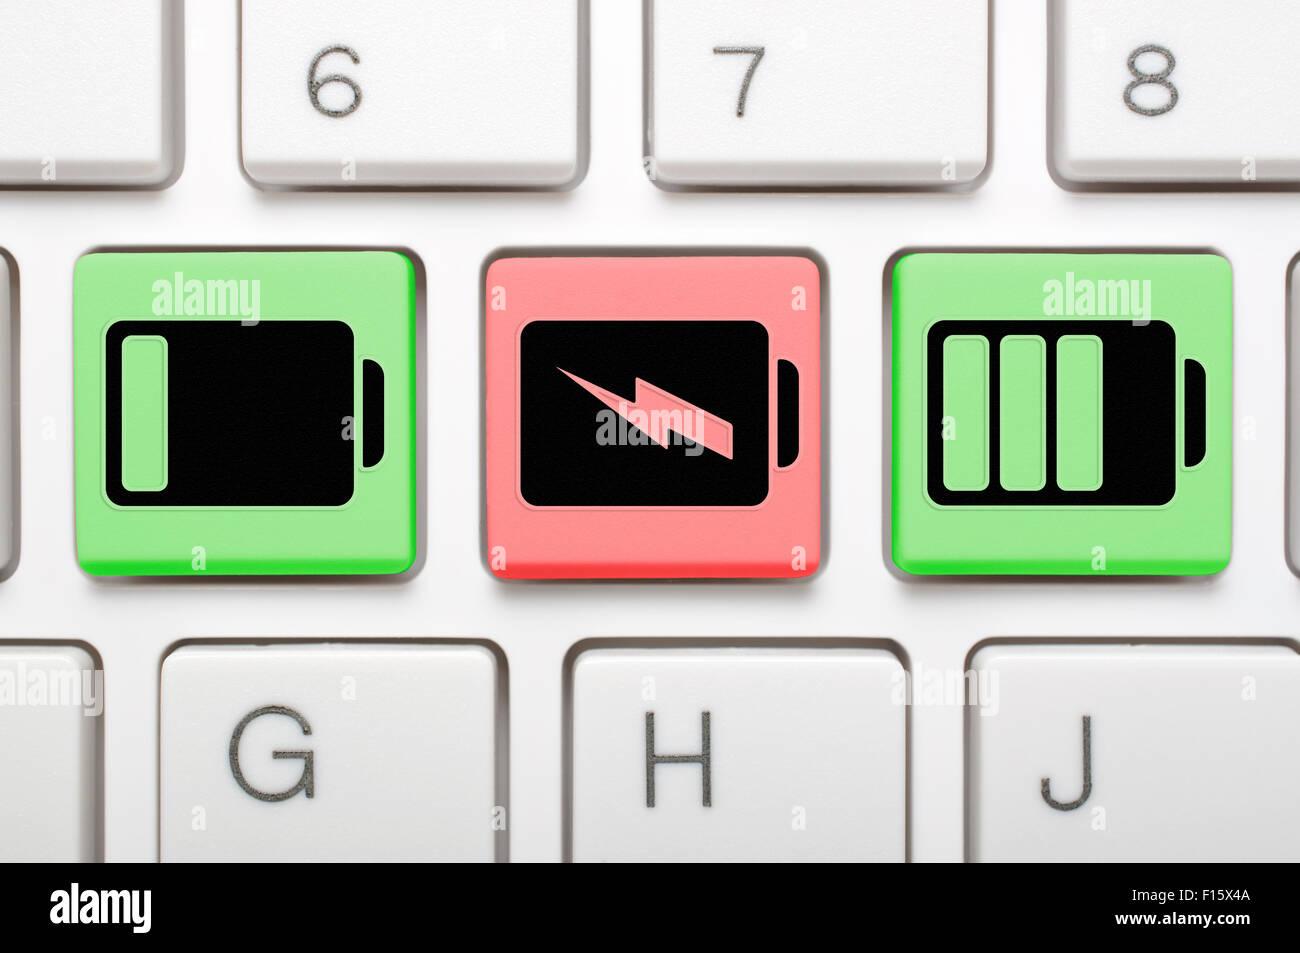 Battery charging status key on keyboard - Stock Image